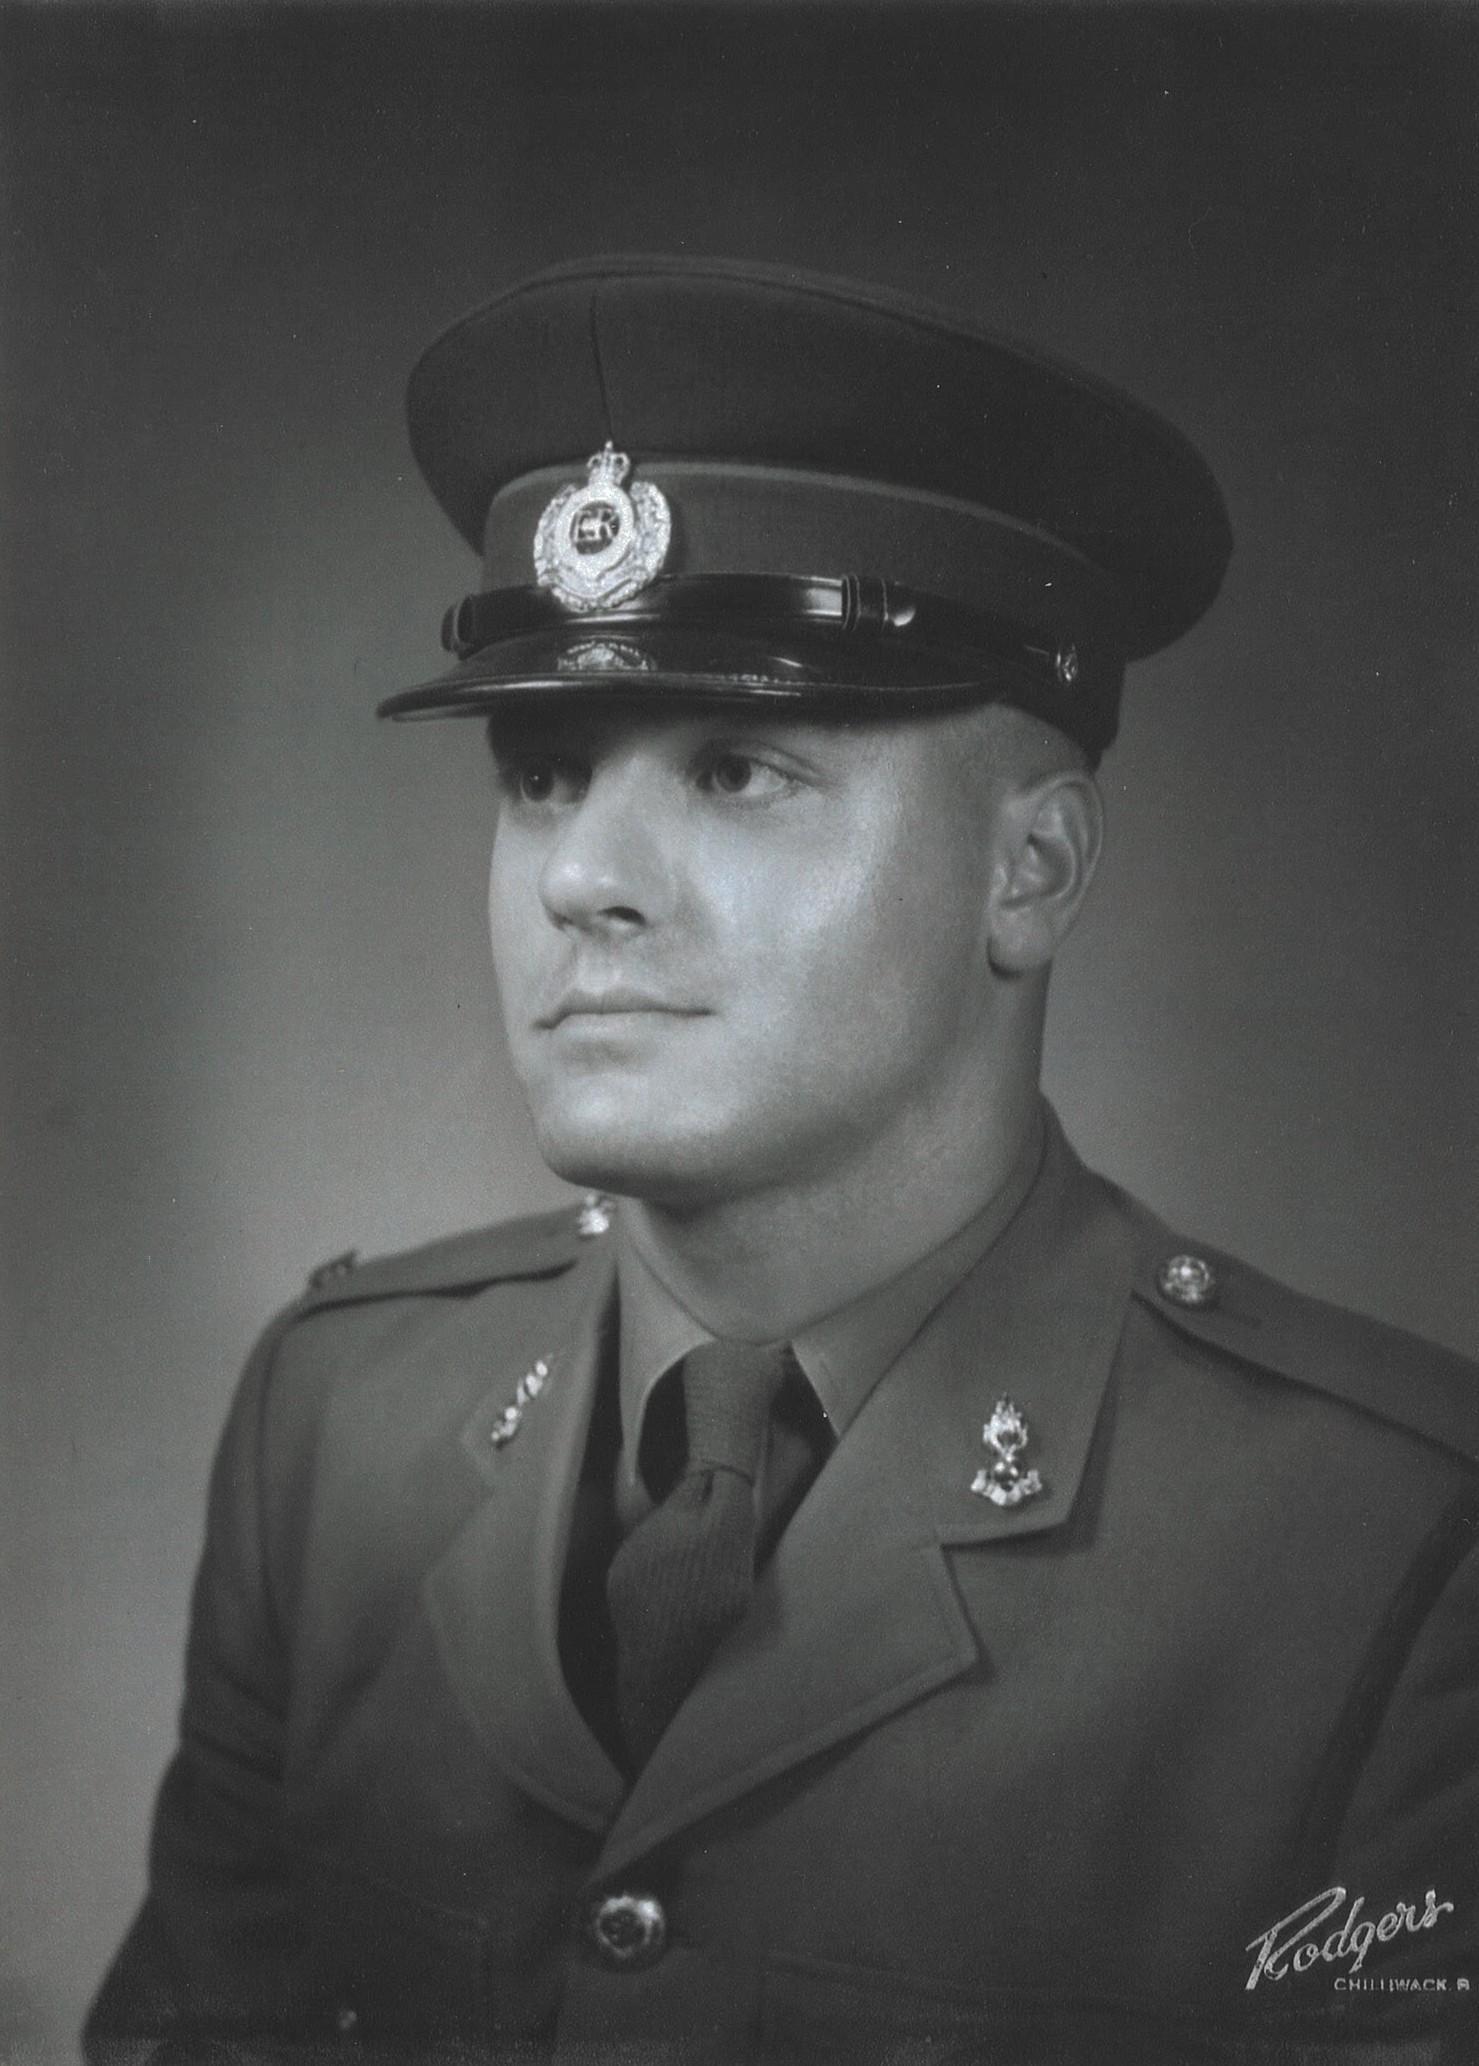 George Allan Wakeford